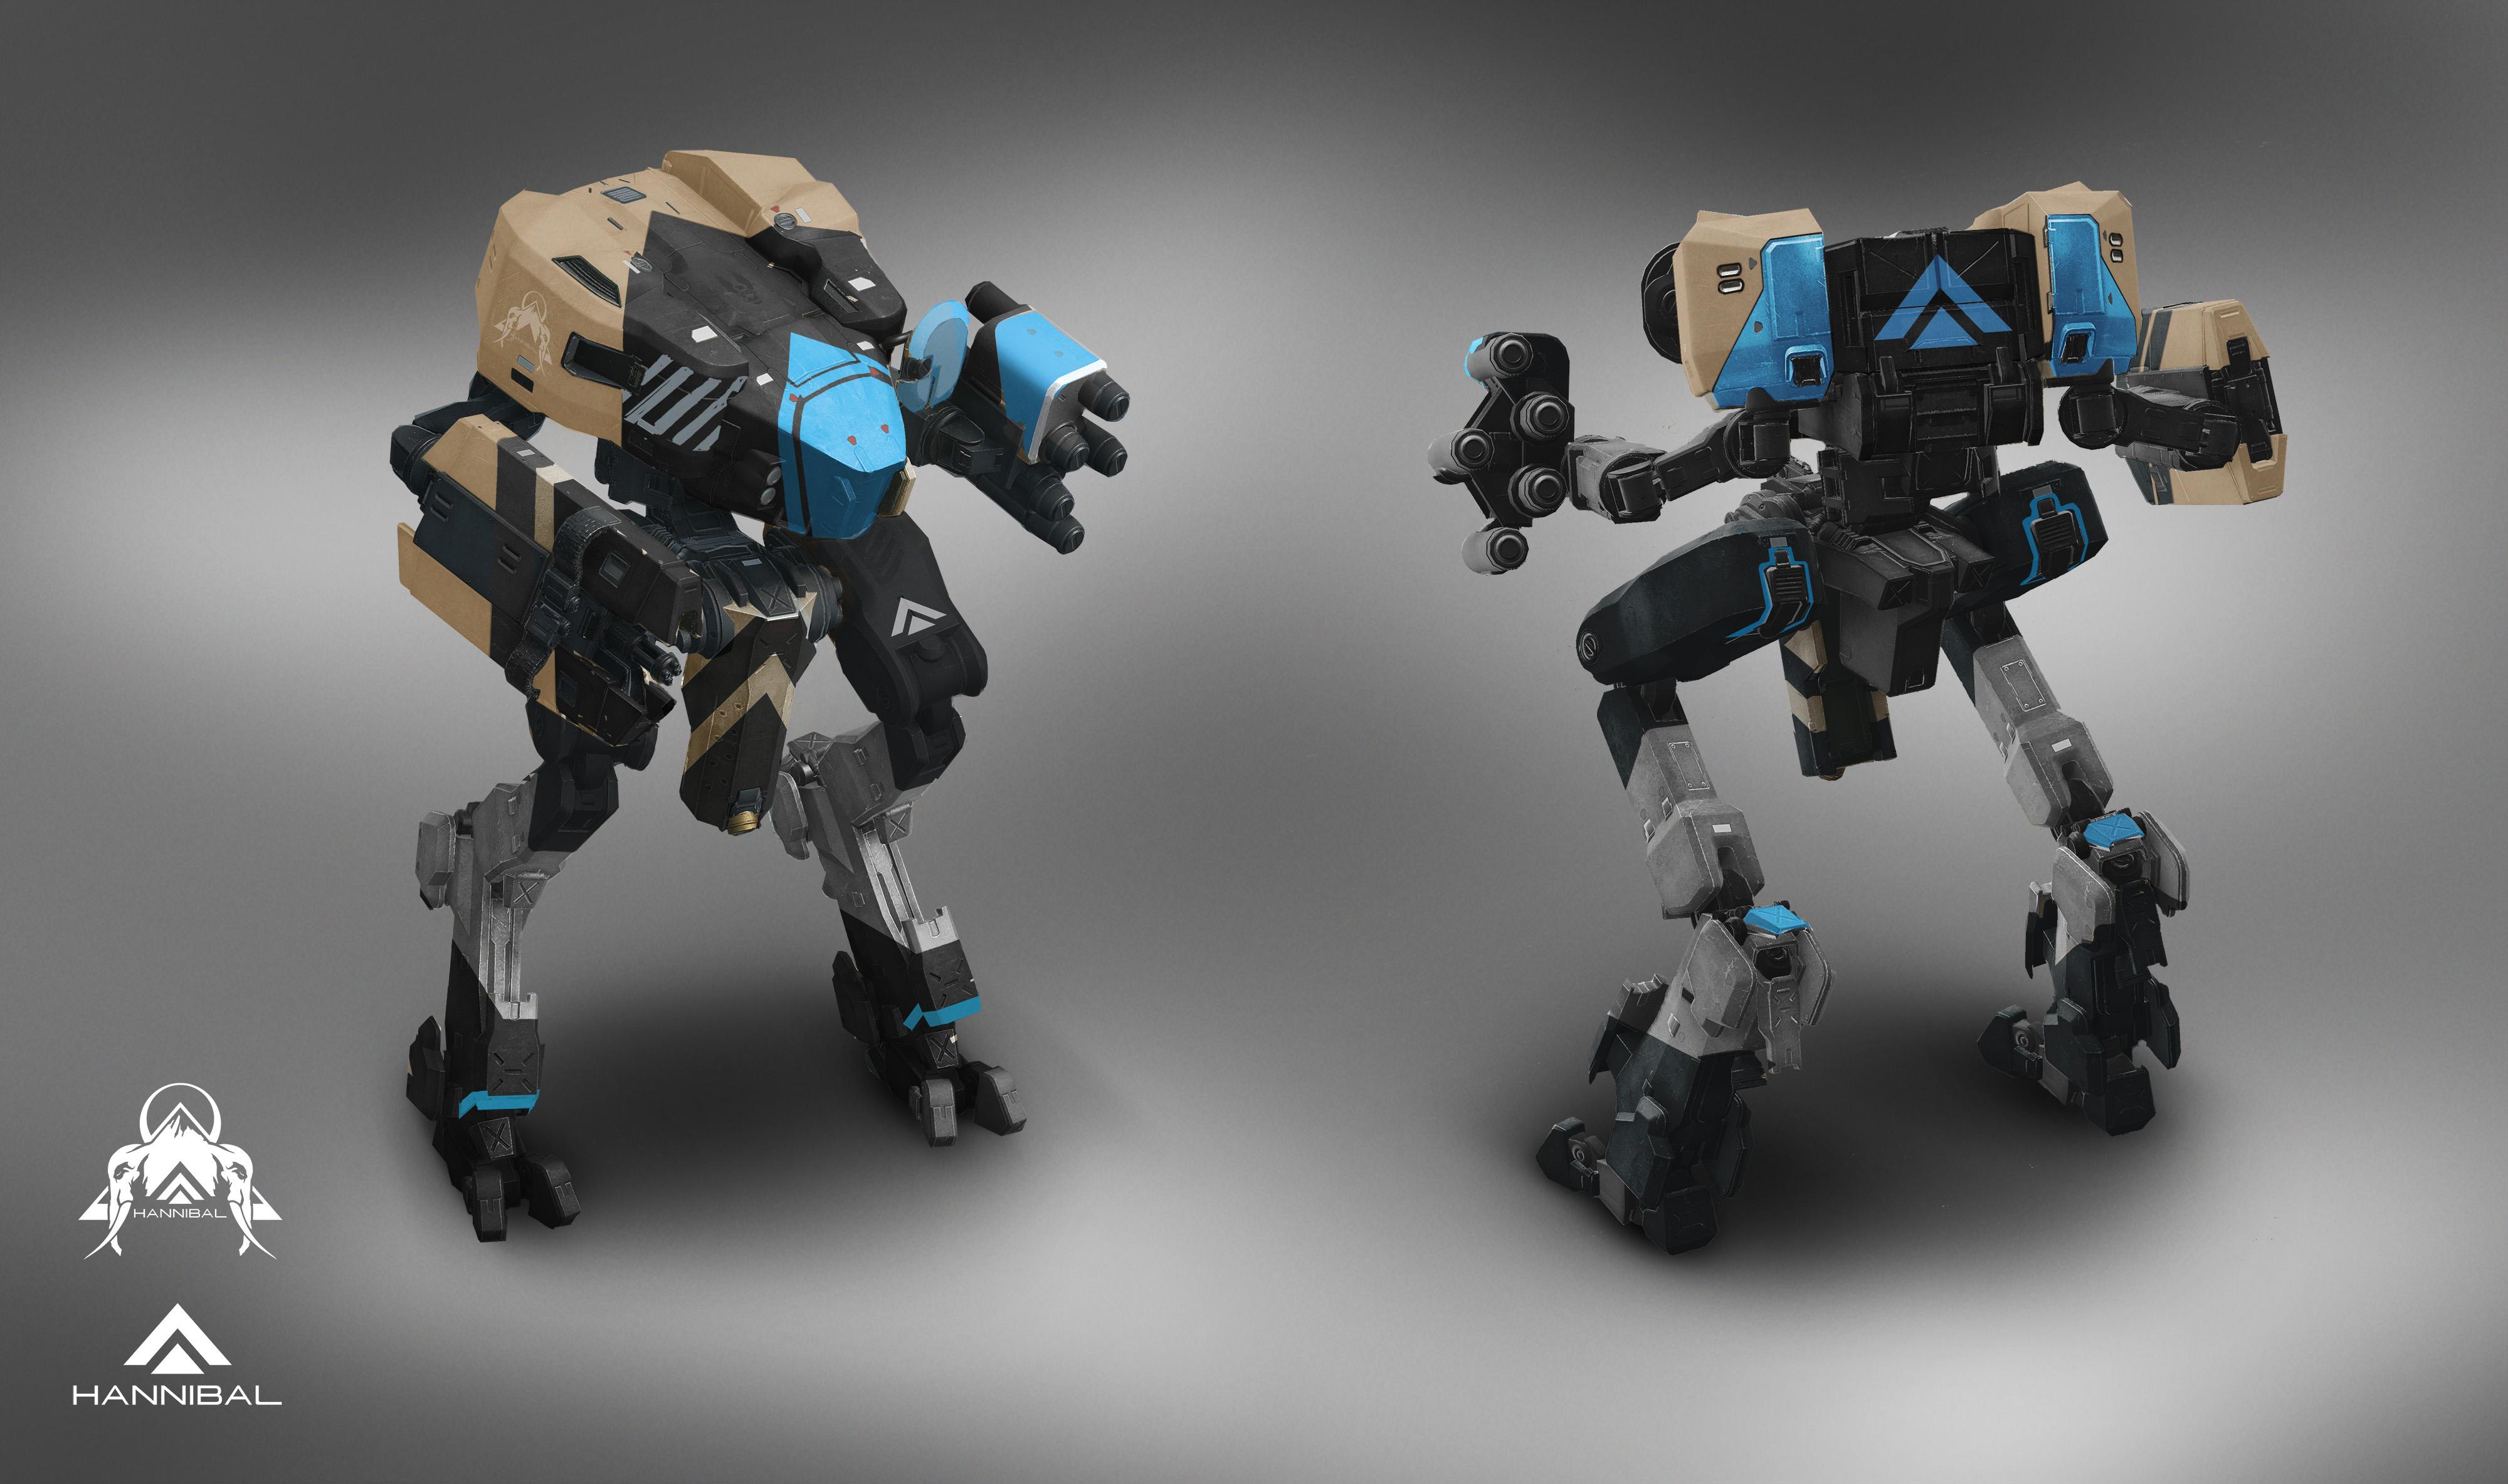 h5-guardians-mantis-hannibal-variant--a07a18cc78334c67868f3297ee618f34